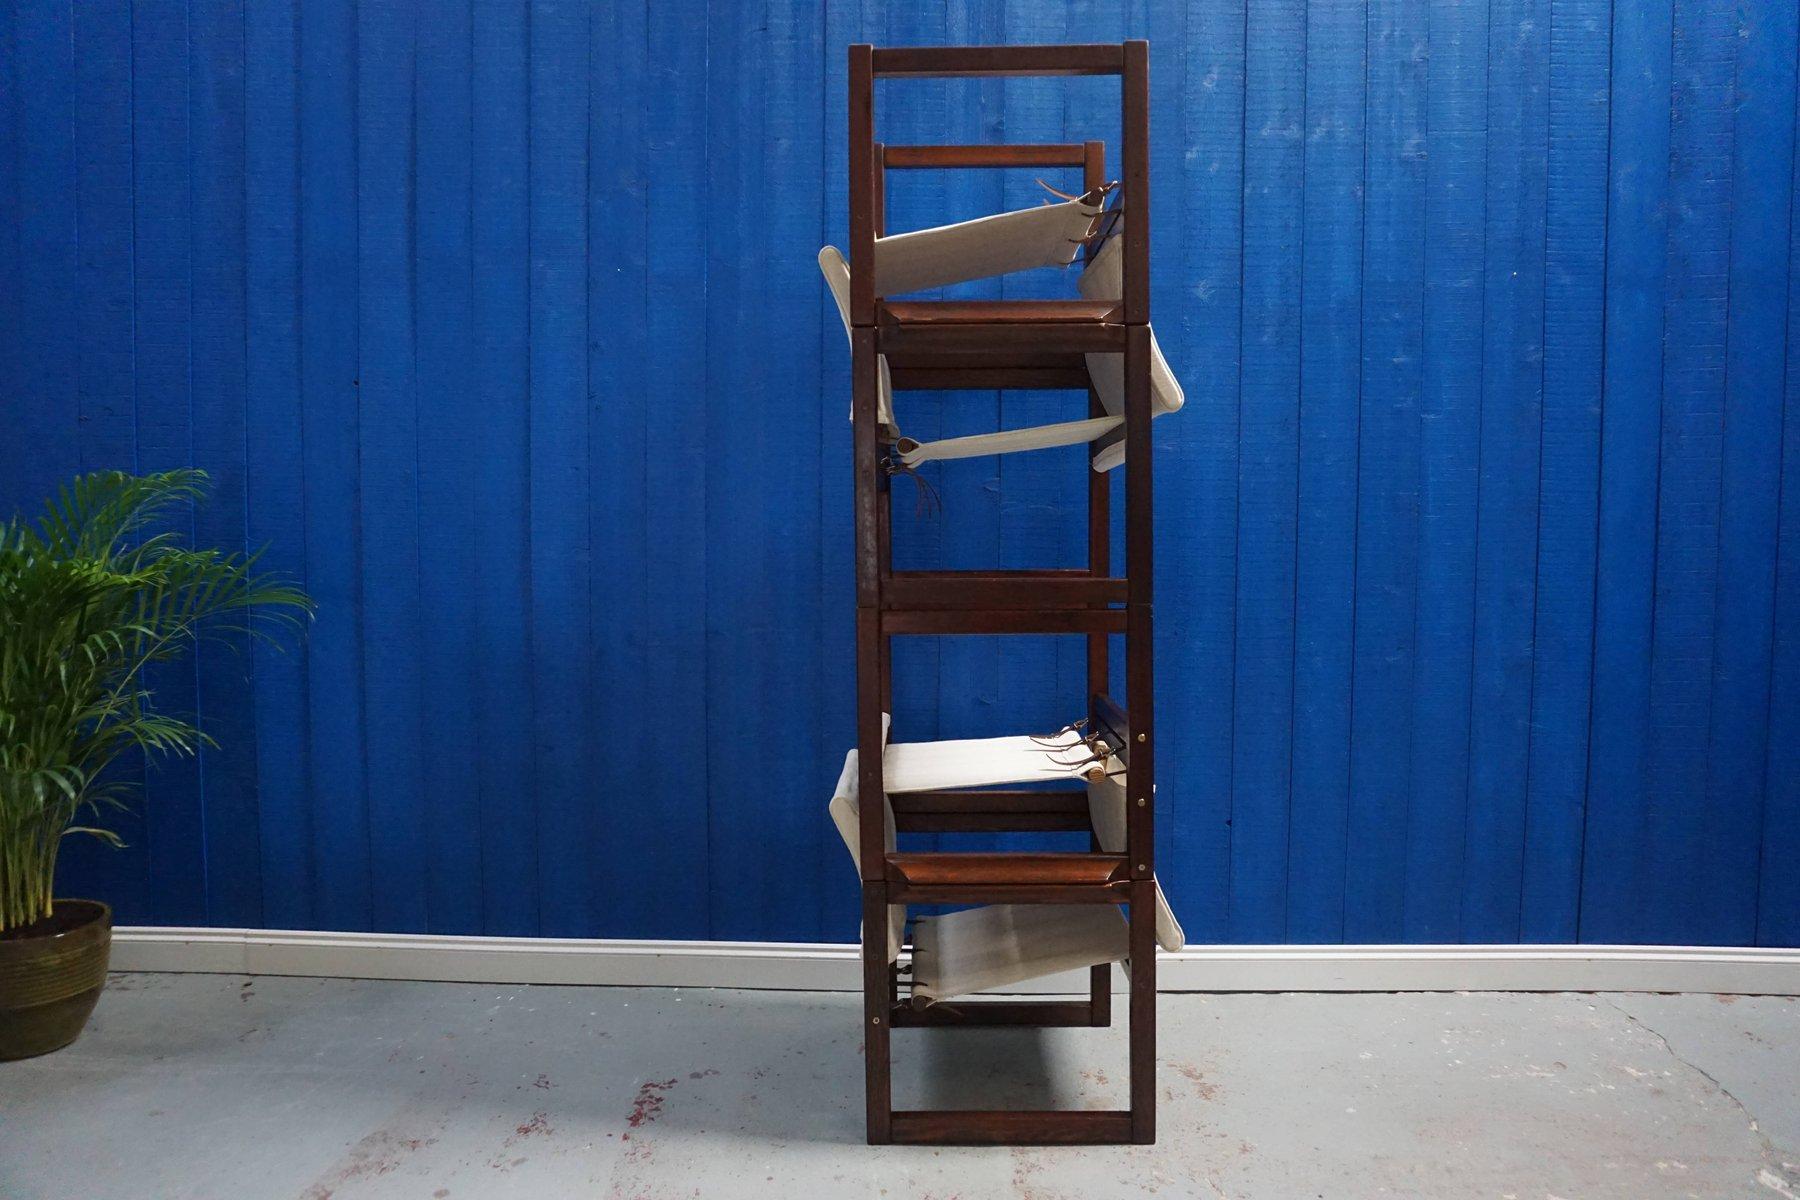 diana safari st hle aus leinen von karin mobring f r ikea. Black Bedroom Furniture Sets. Home Design Ideas